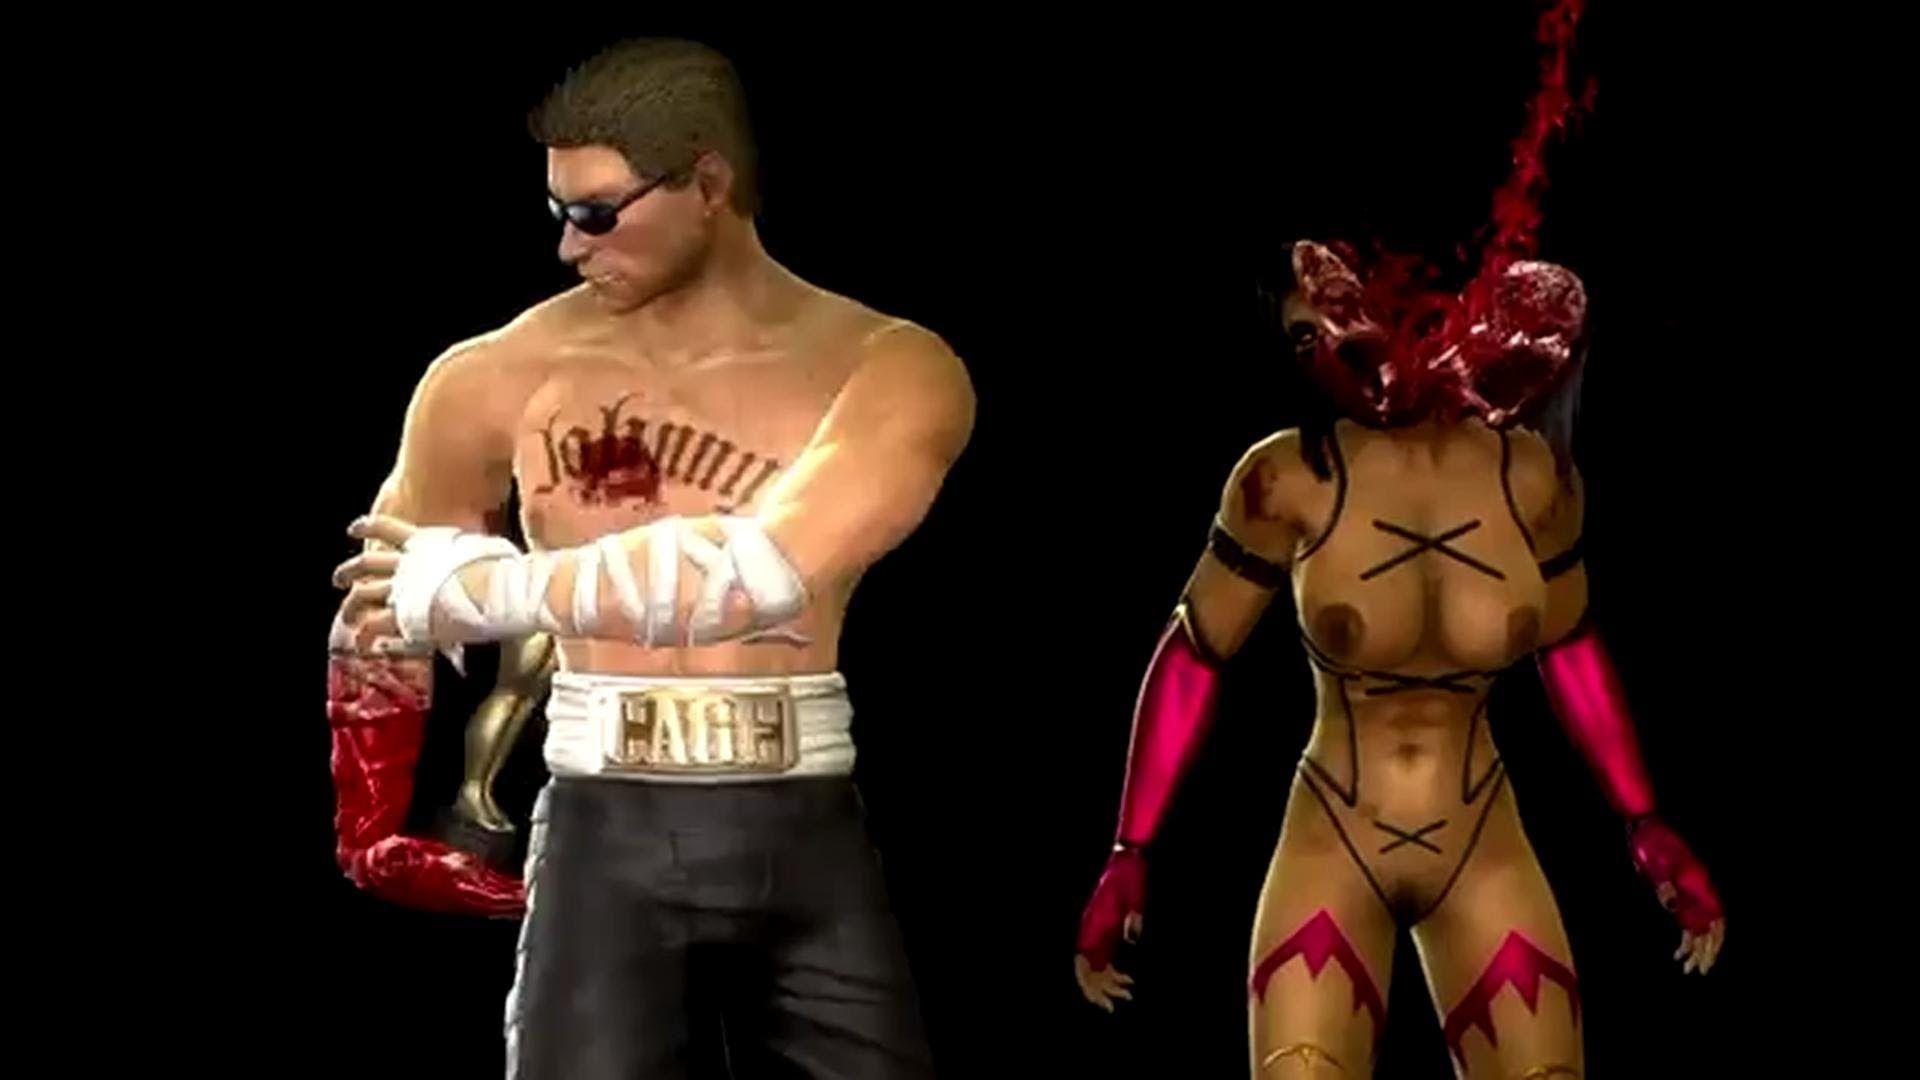 Mortal kombat xxx porn images hentai pictures